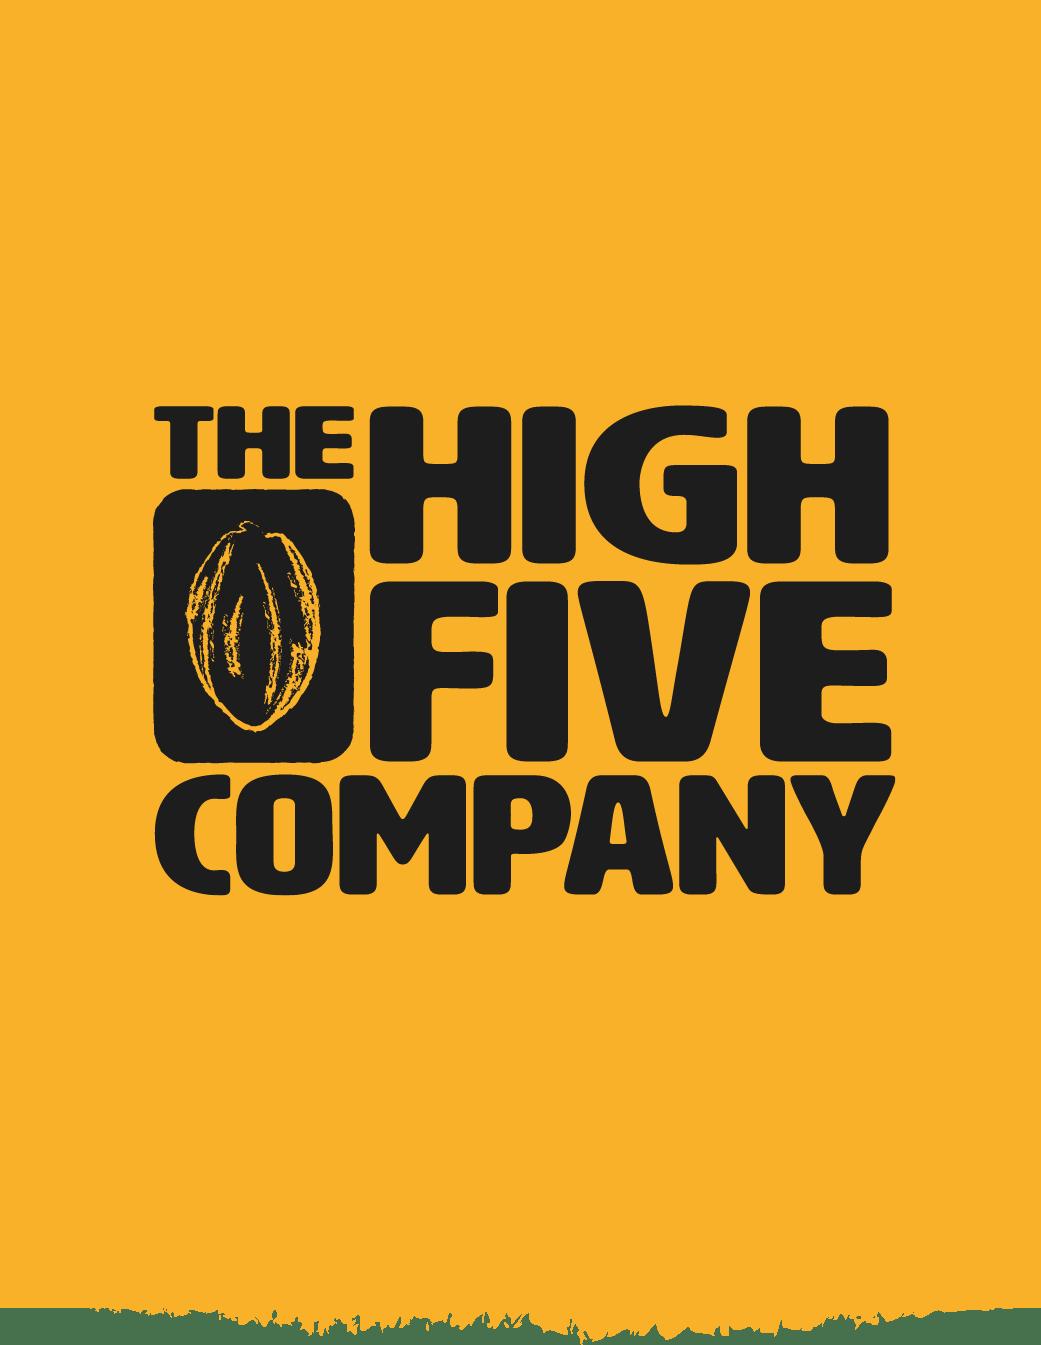 The High Five Company